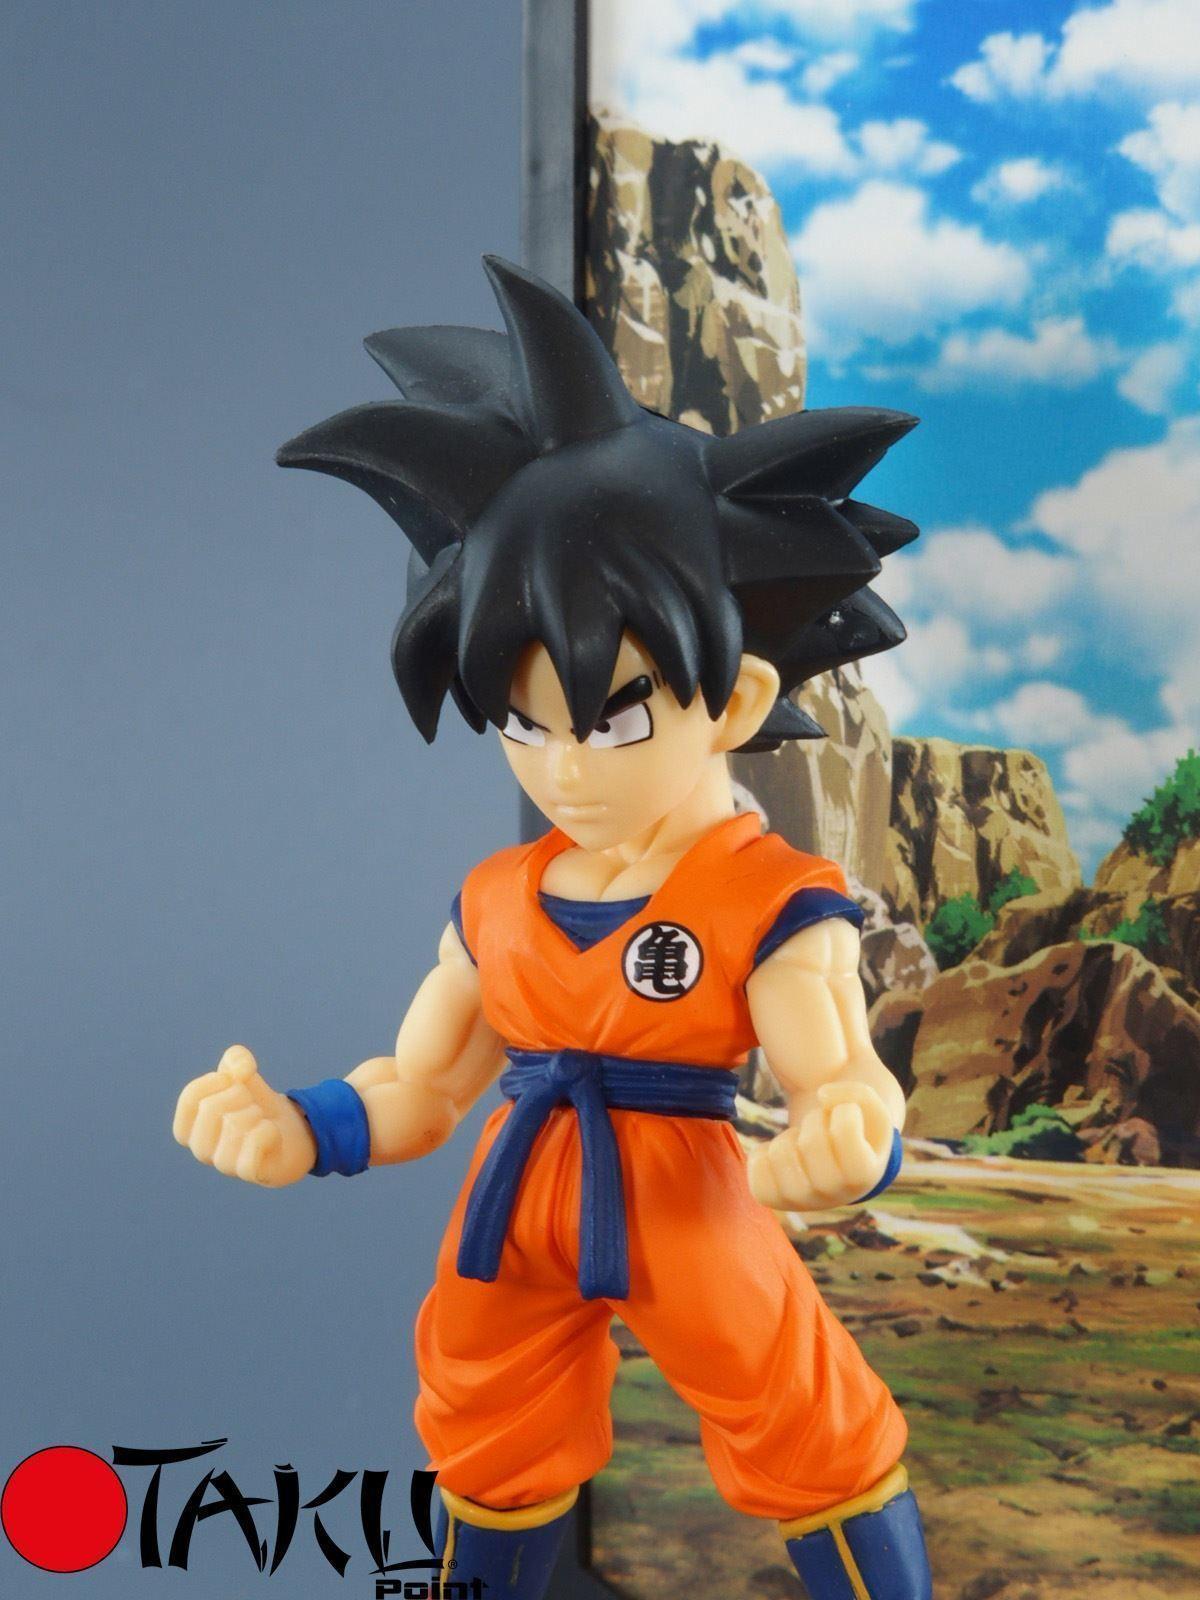 Dragon Ball Z Buddy Action Figure Son Goku. Otakupoint